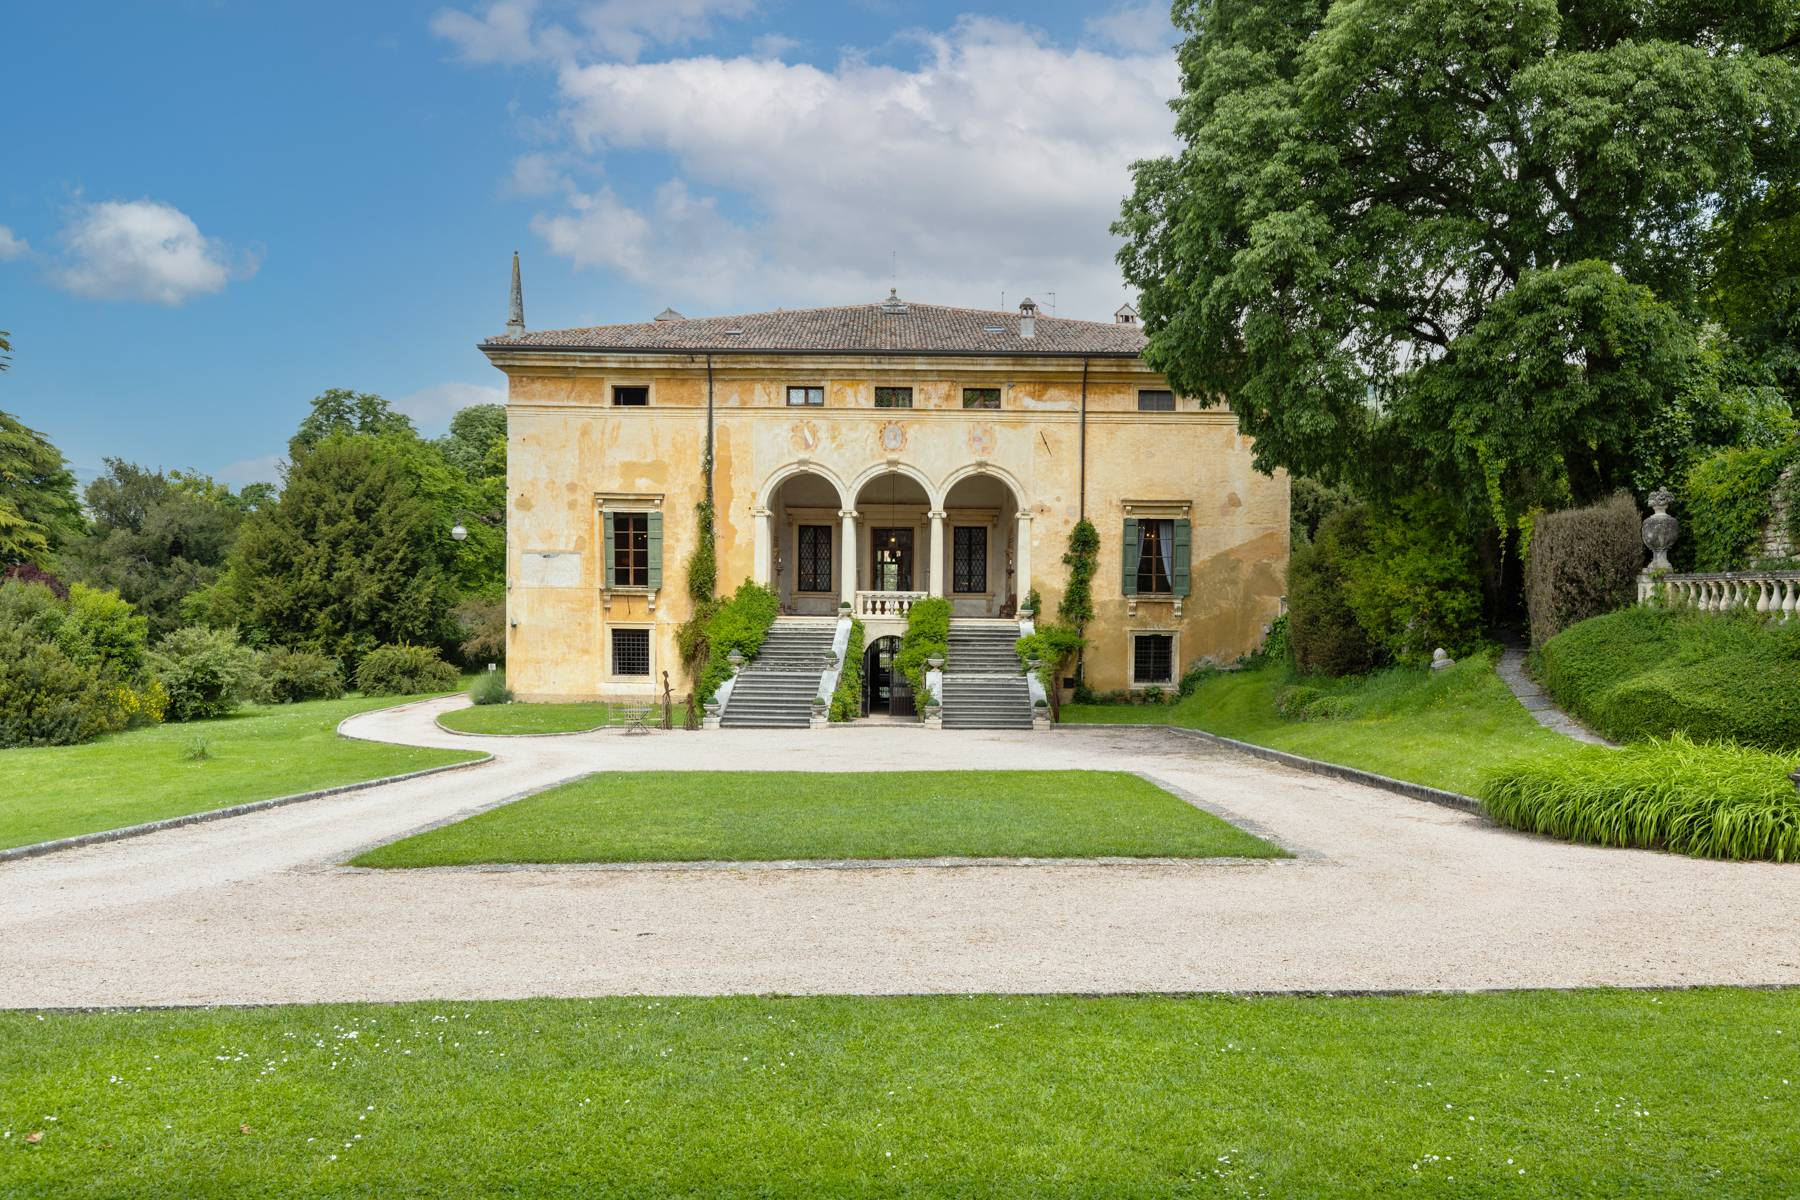 Villa in Vendita a Verona: 5 locali, 2400 mq - Foto 8